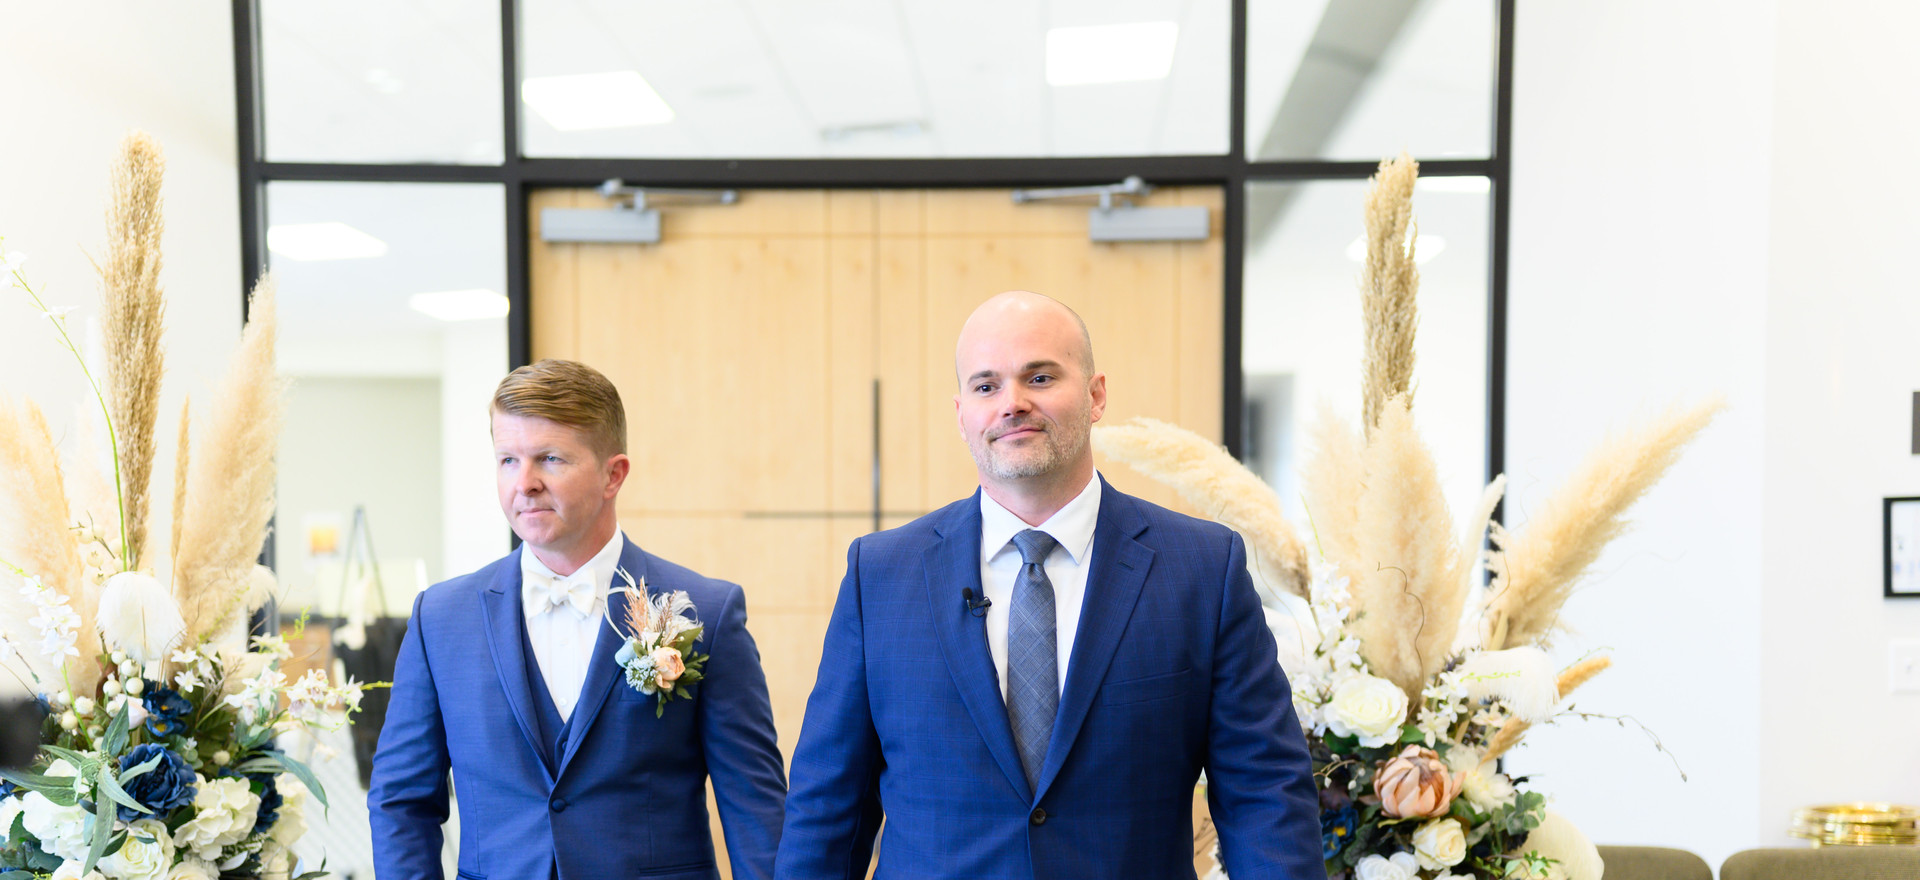 042_Lorena and Mike's Wedding day.jpg